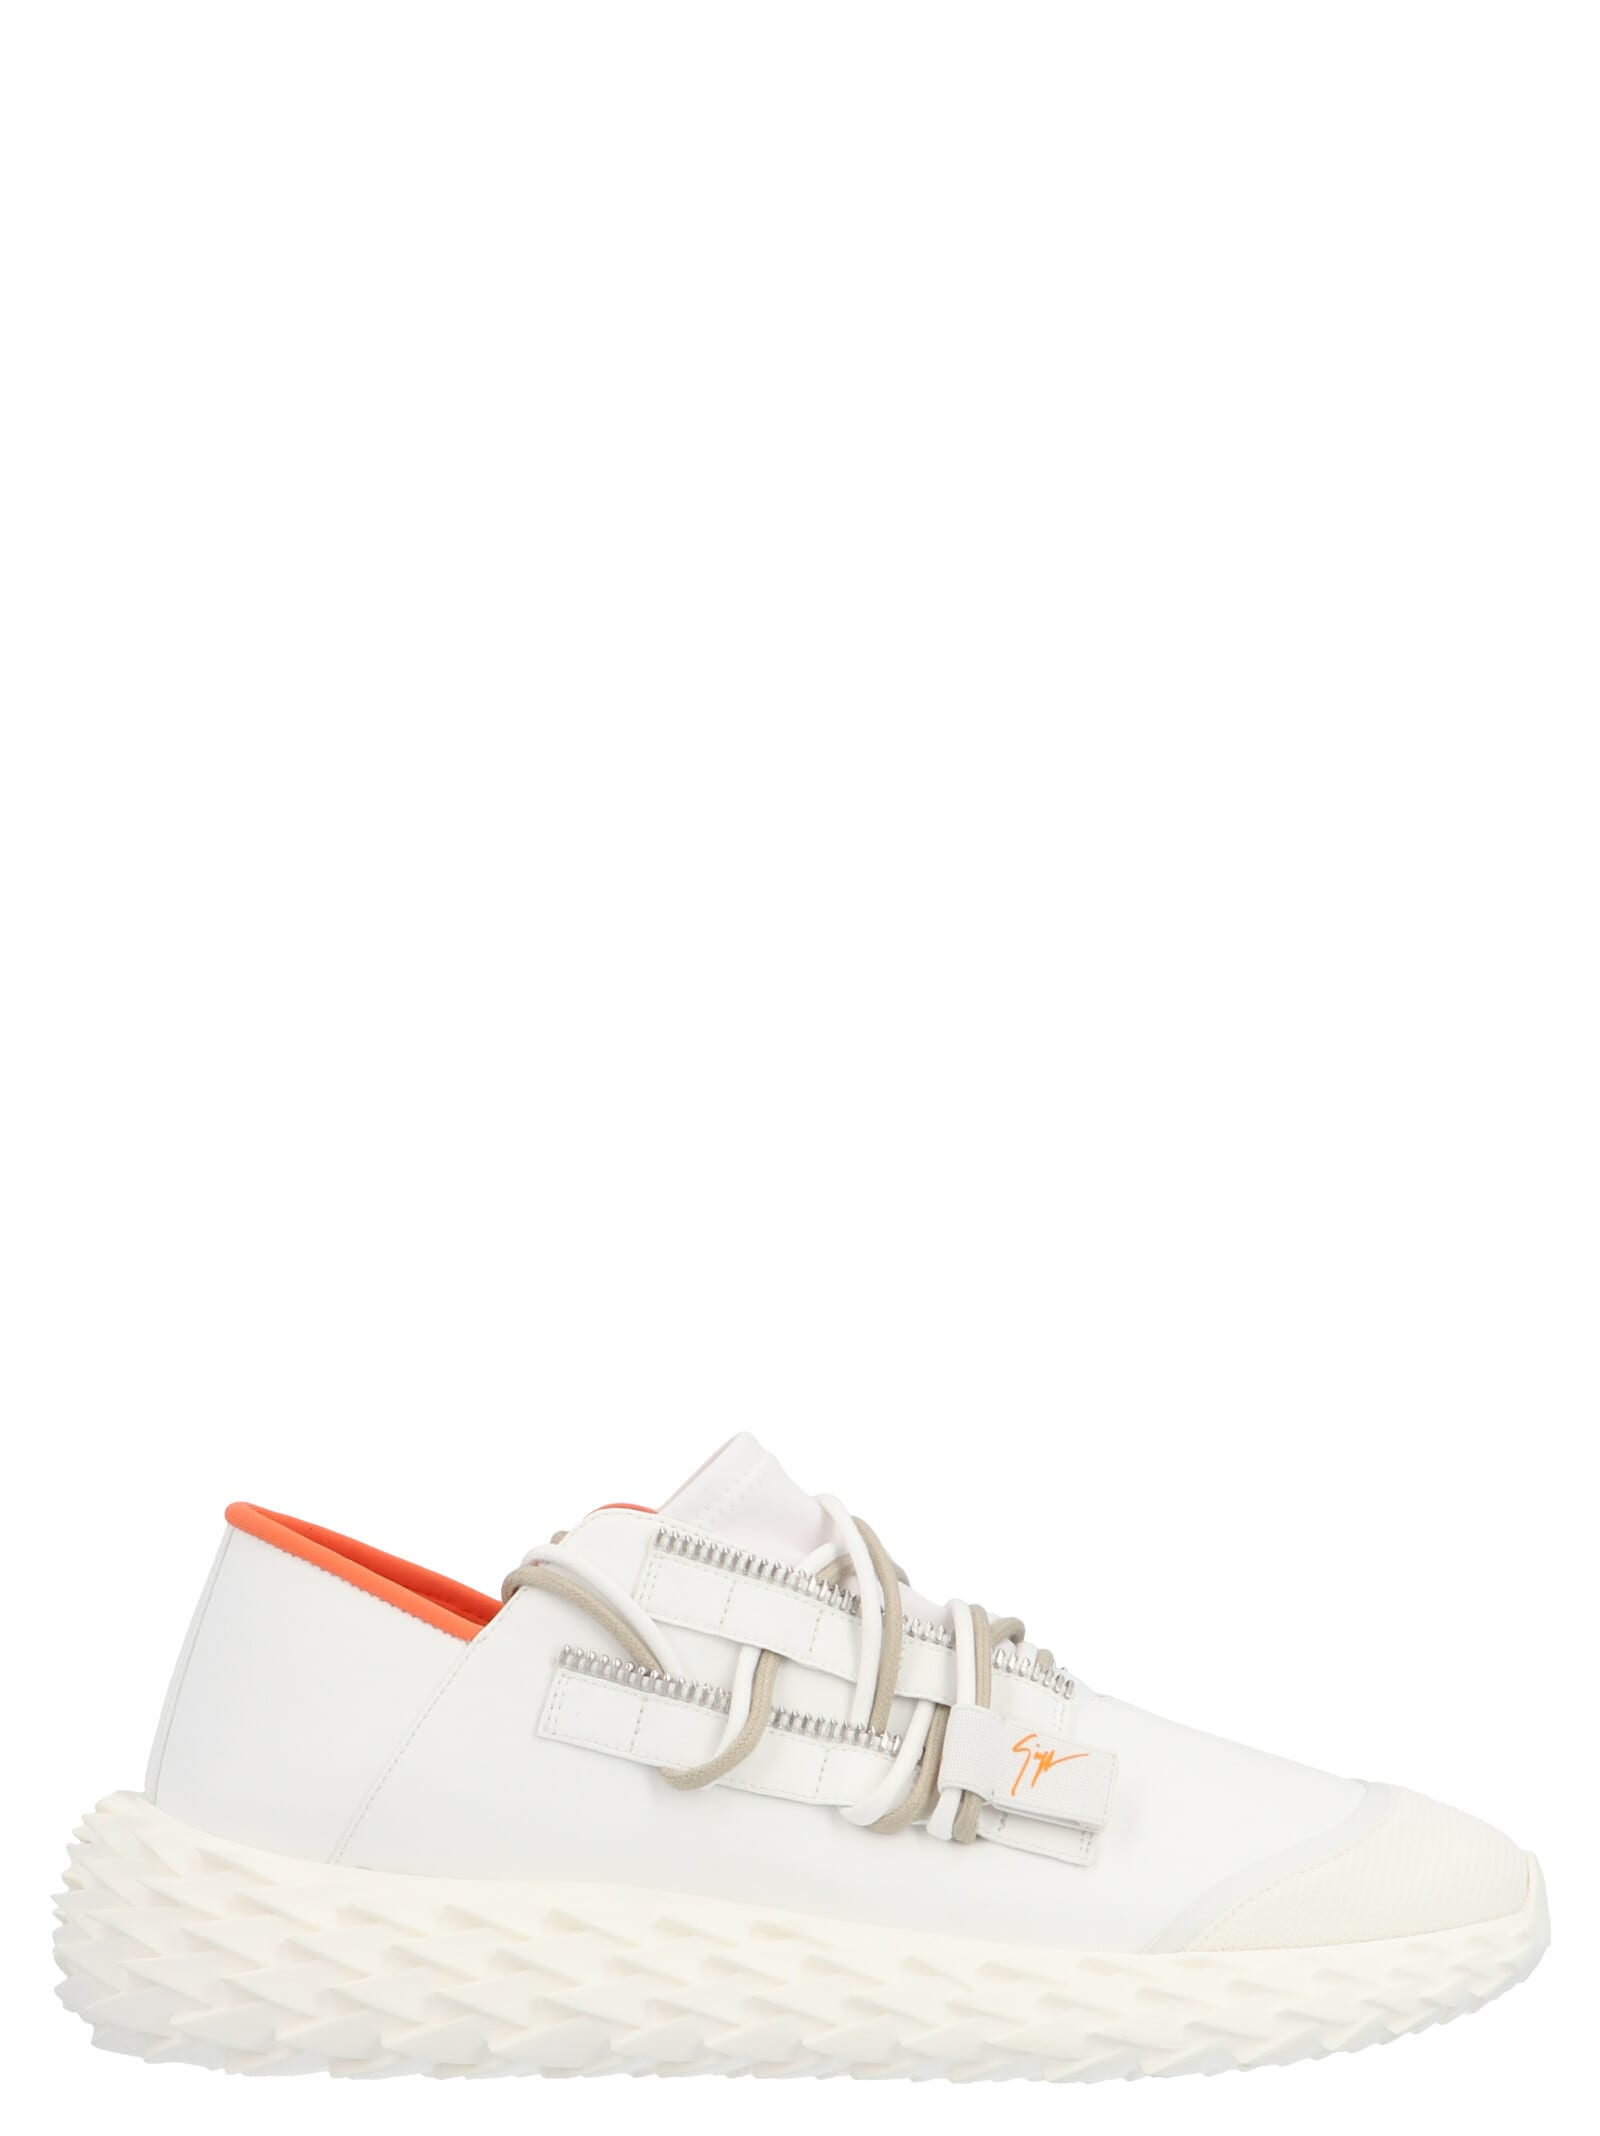 Giuseppe Zanotti urchin Shoes